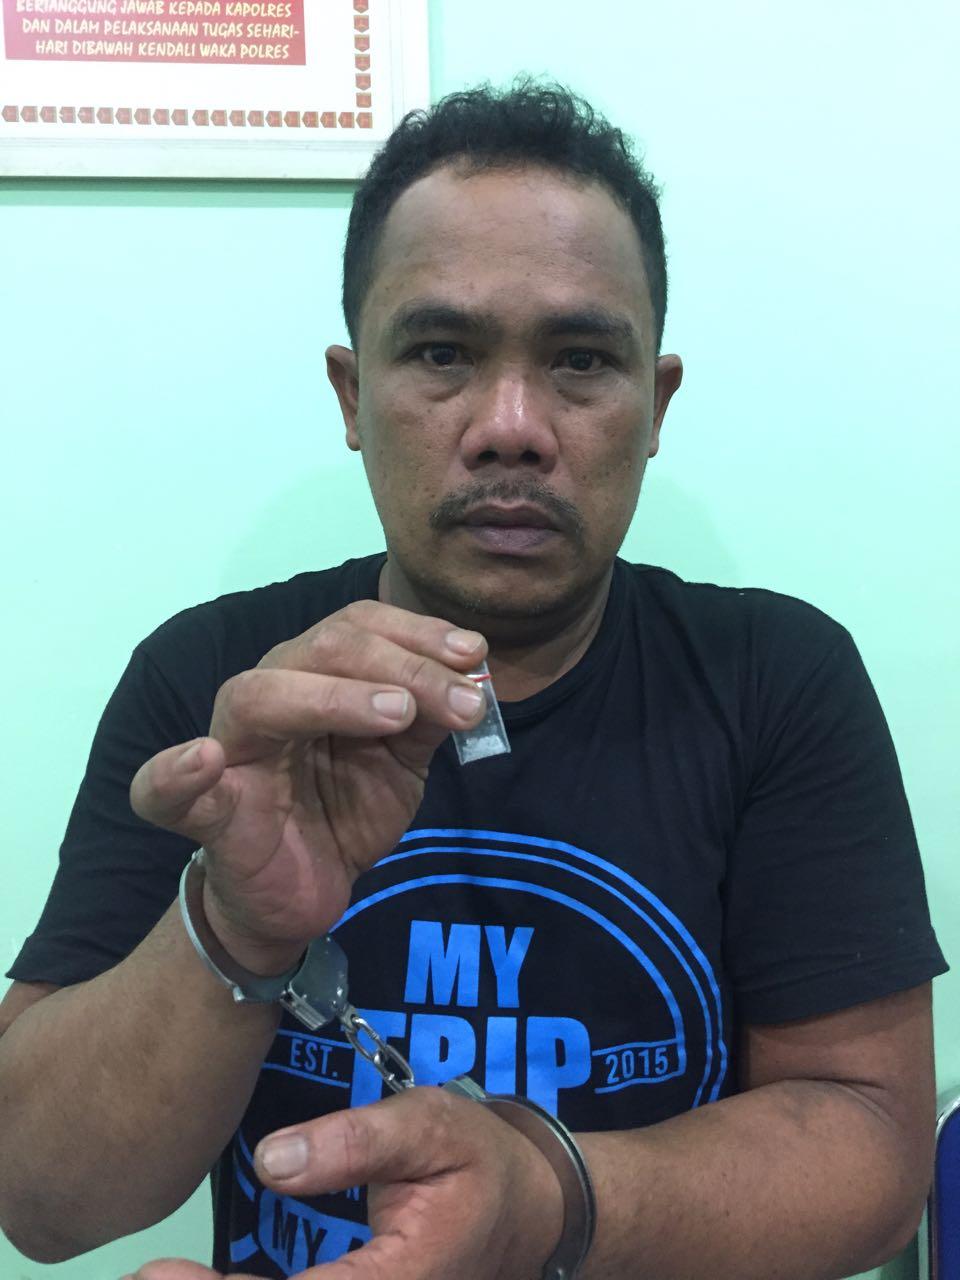 Tersangka Sangkot Simamora memperlihatkan barang bukti paket sabu.